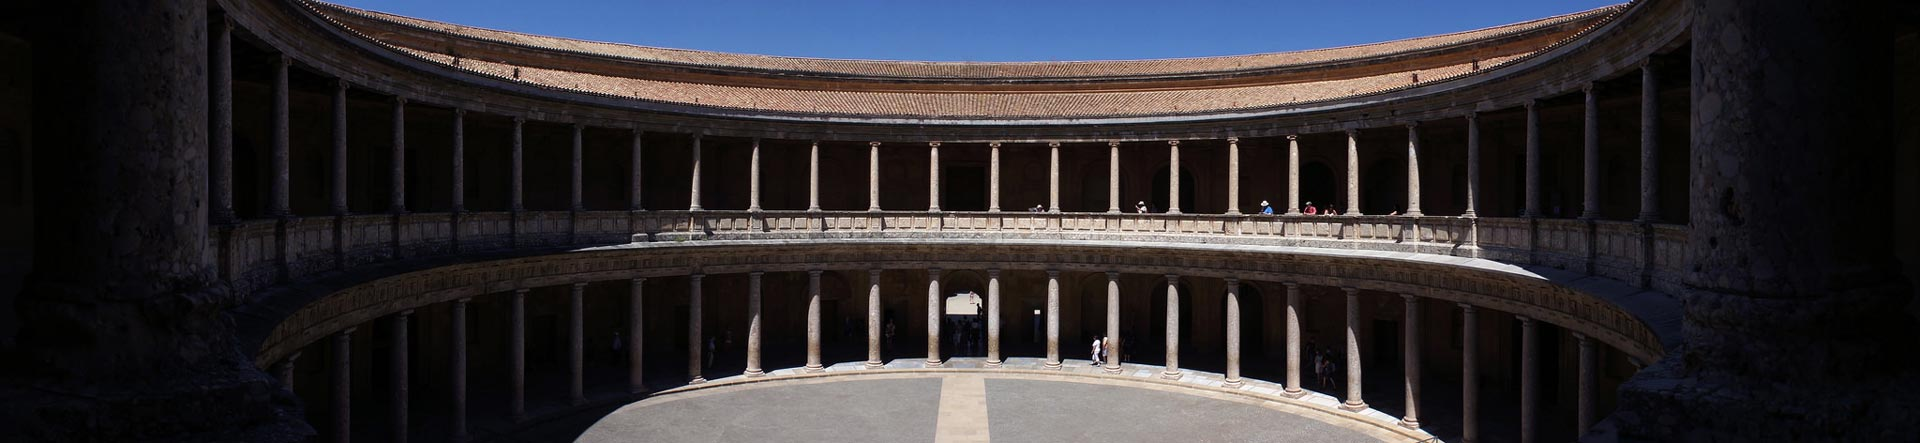 alhambra, guida essenziale